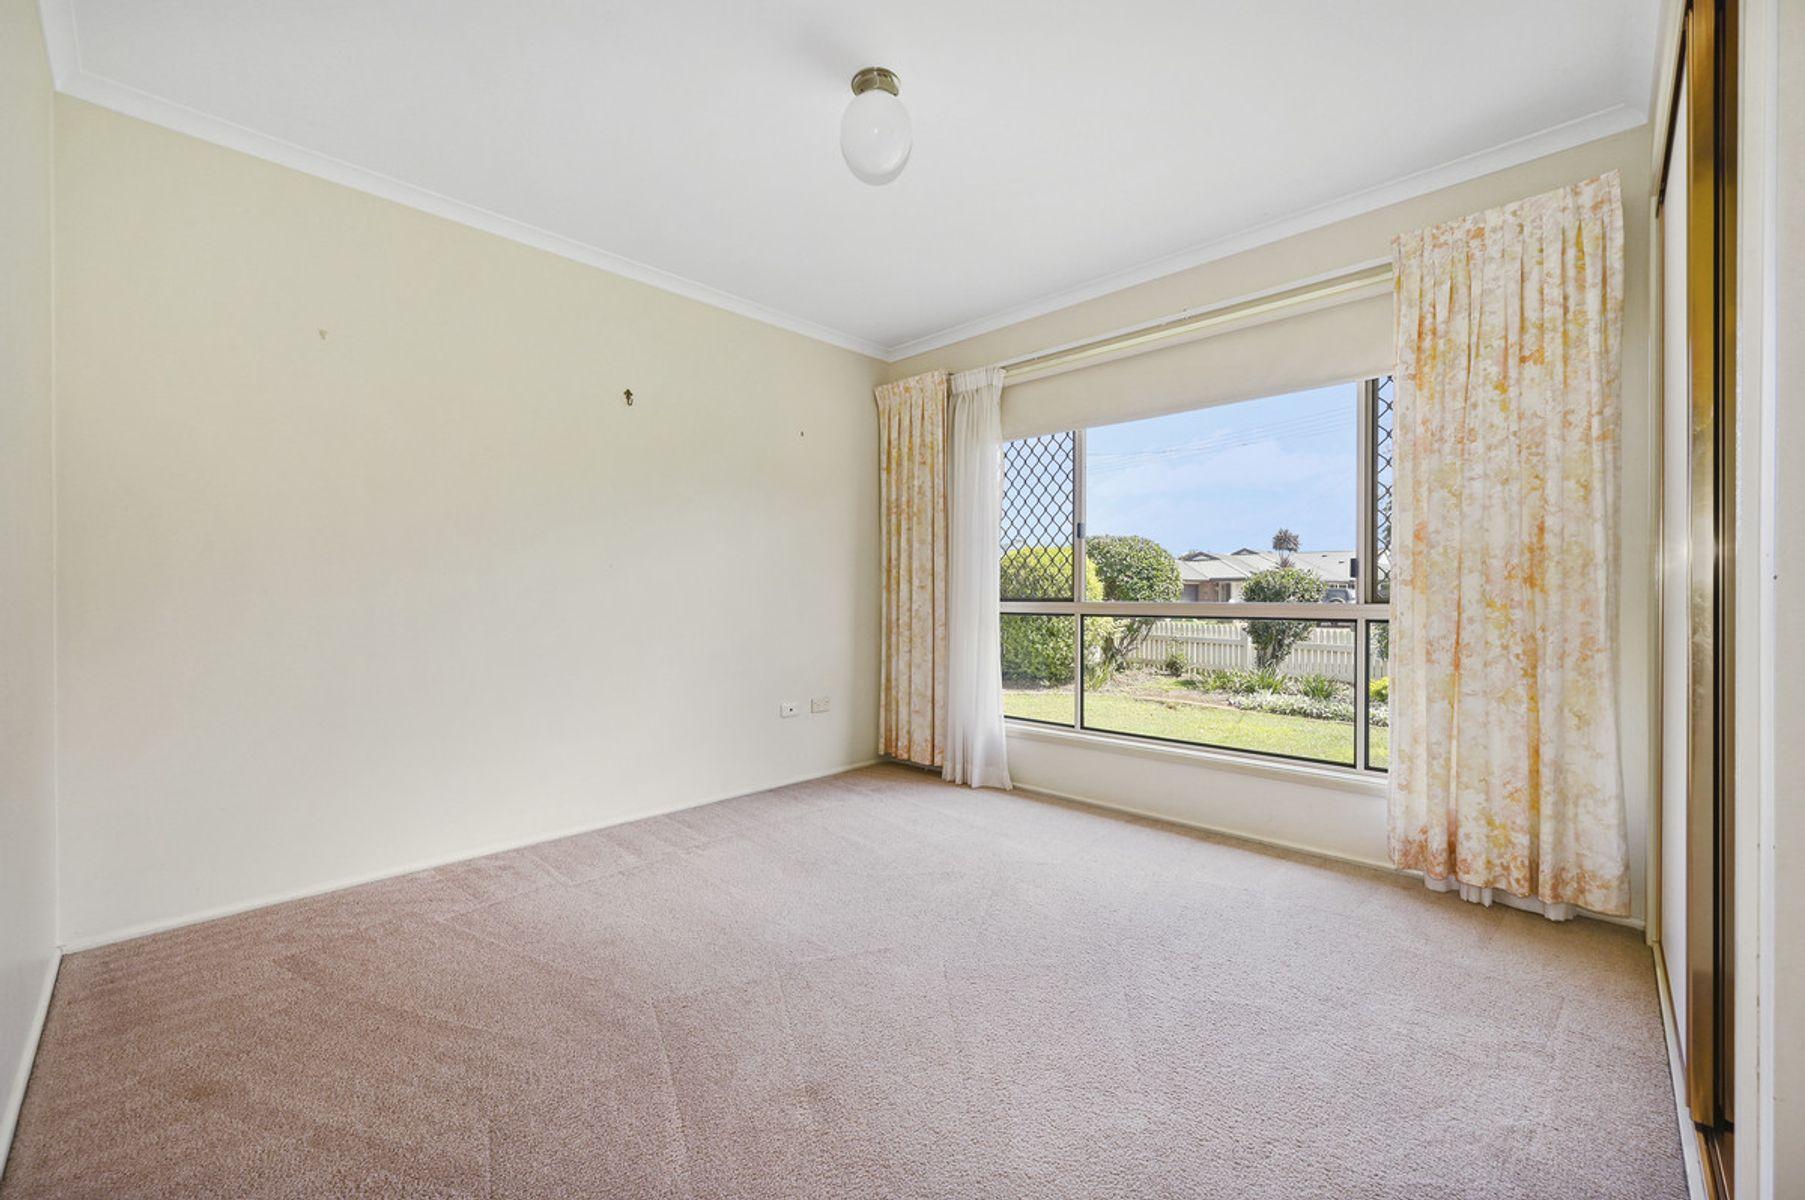 122 Rowbotham Street, Rangeville, QLD 4350